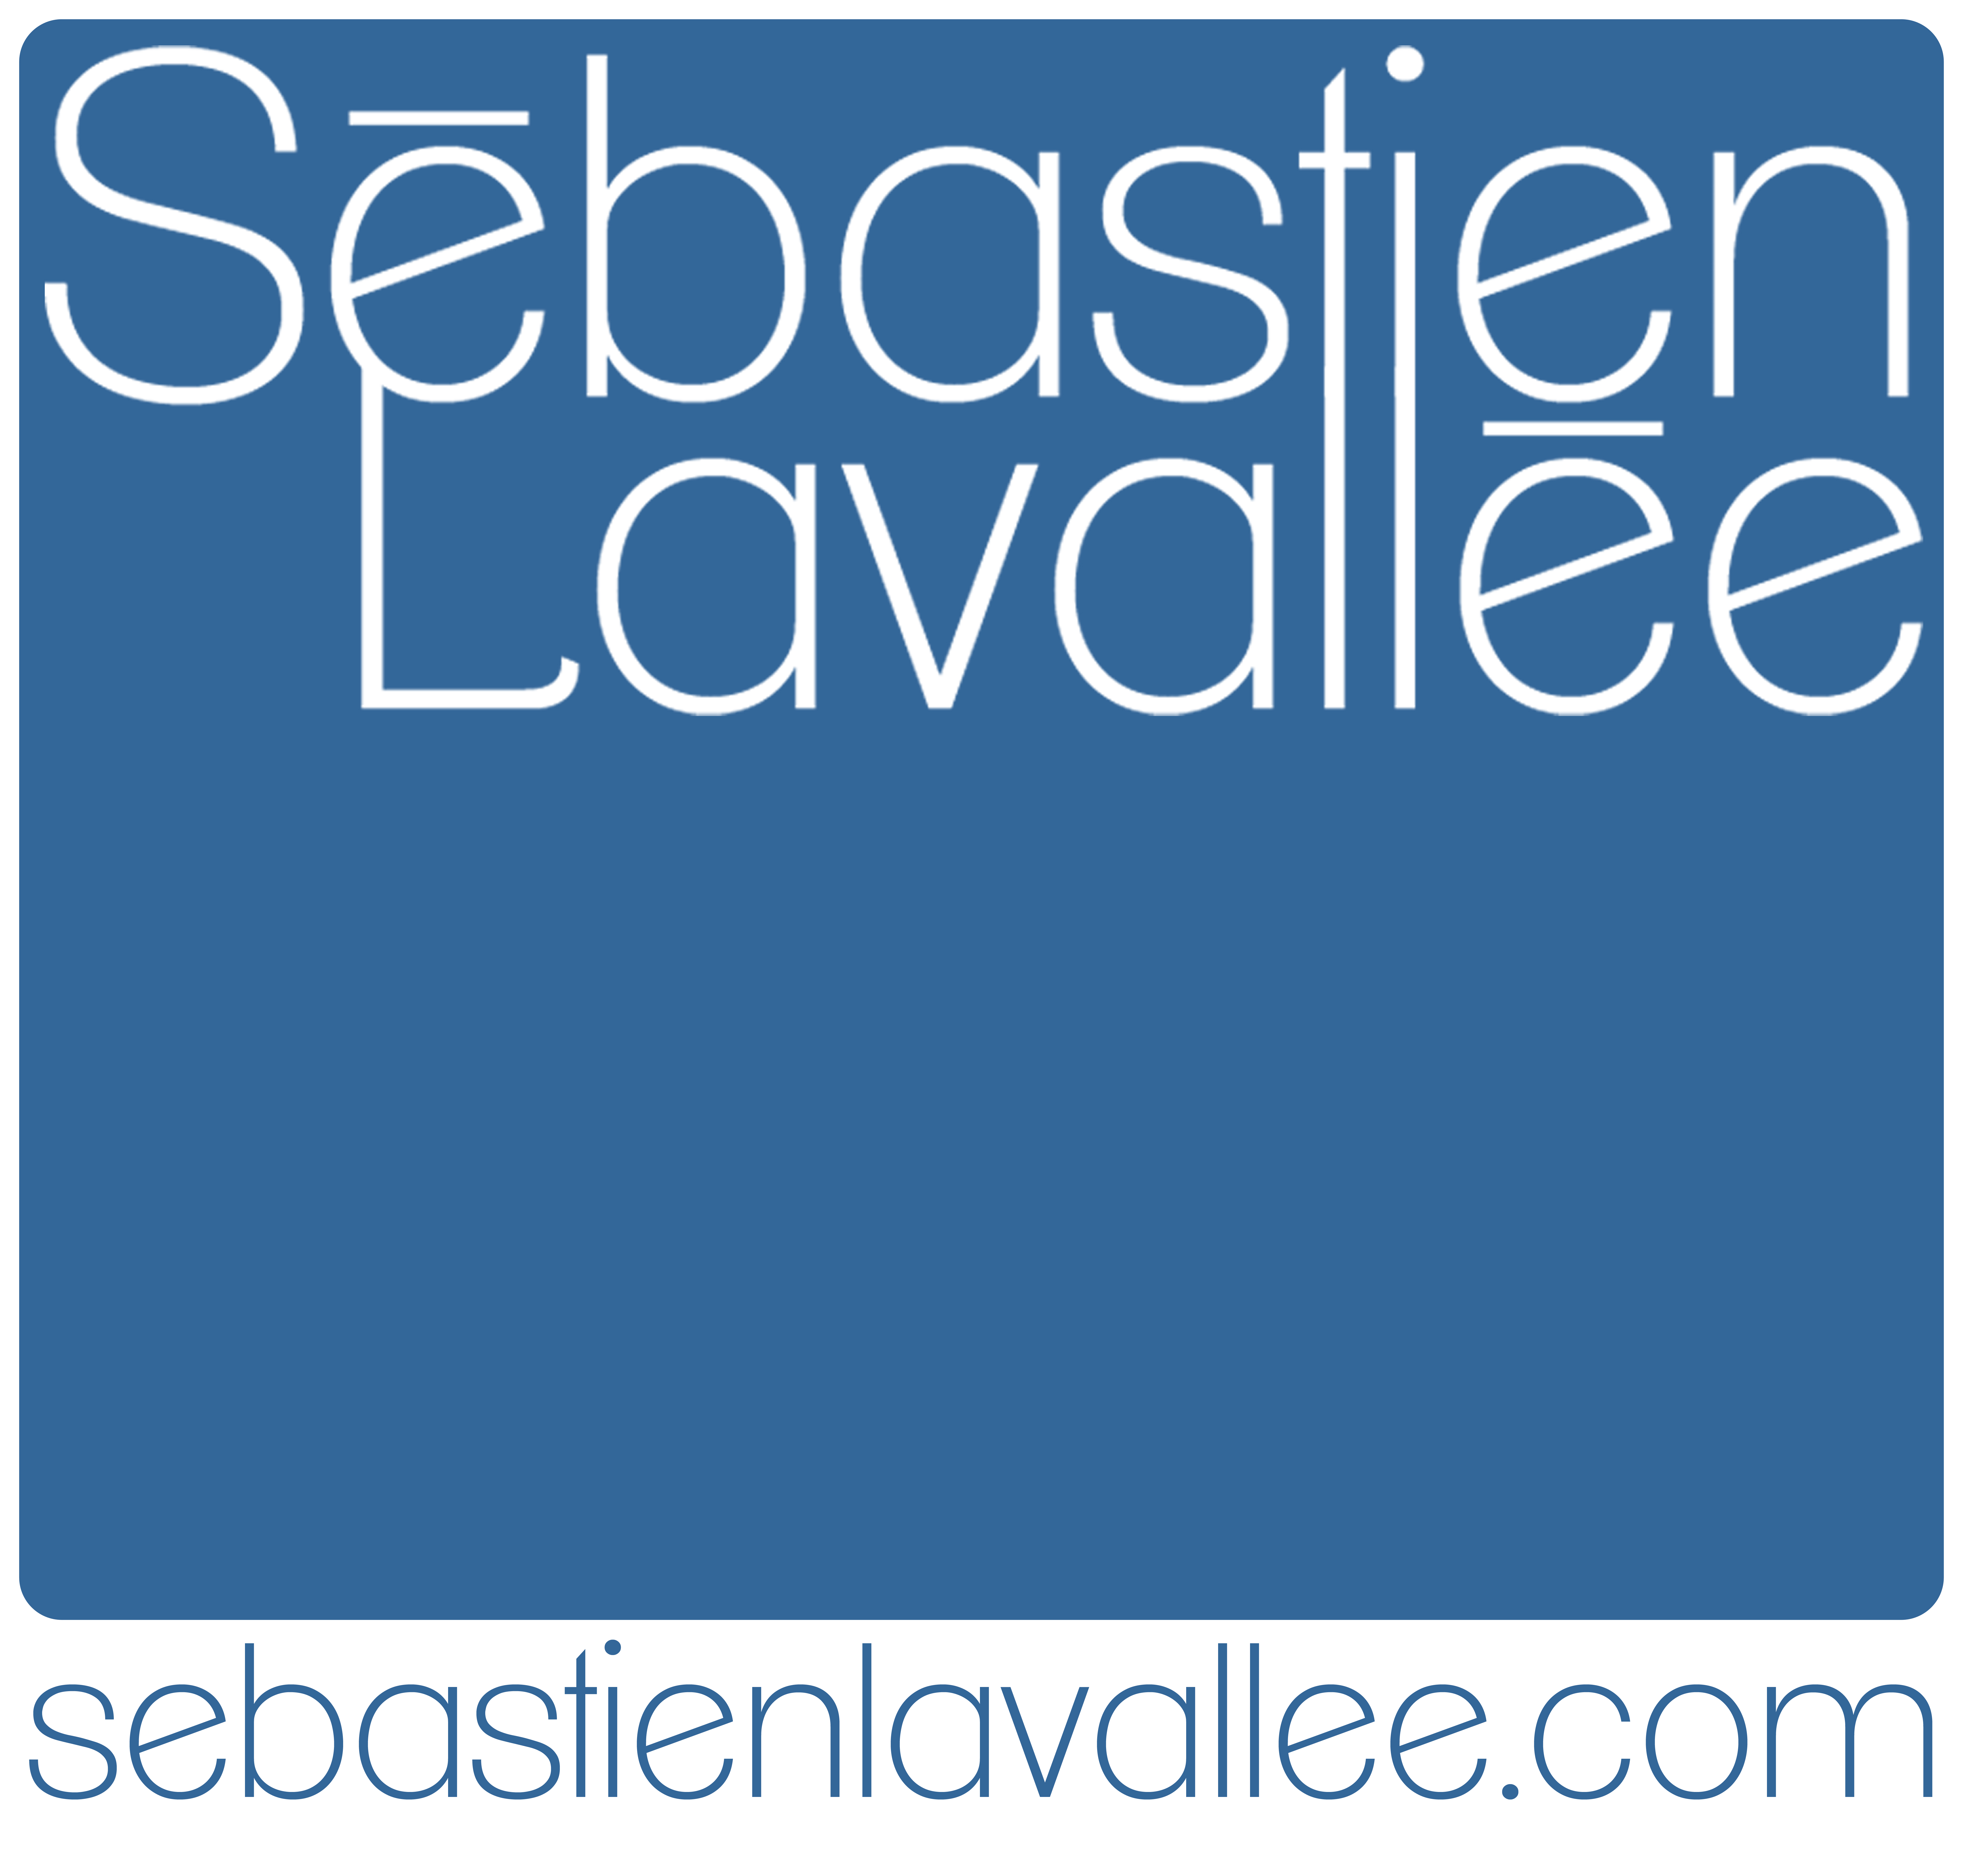 Sébastien Lavallée